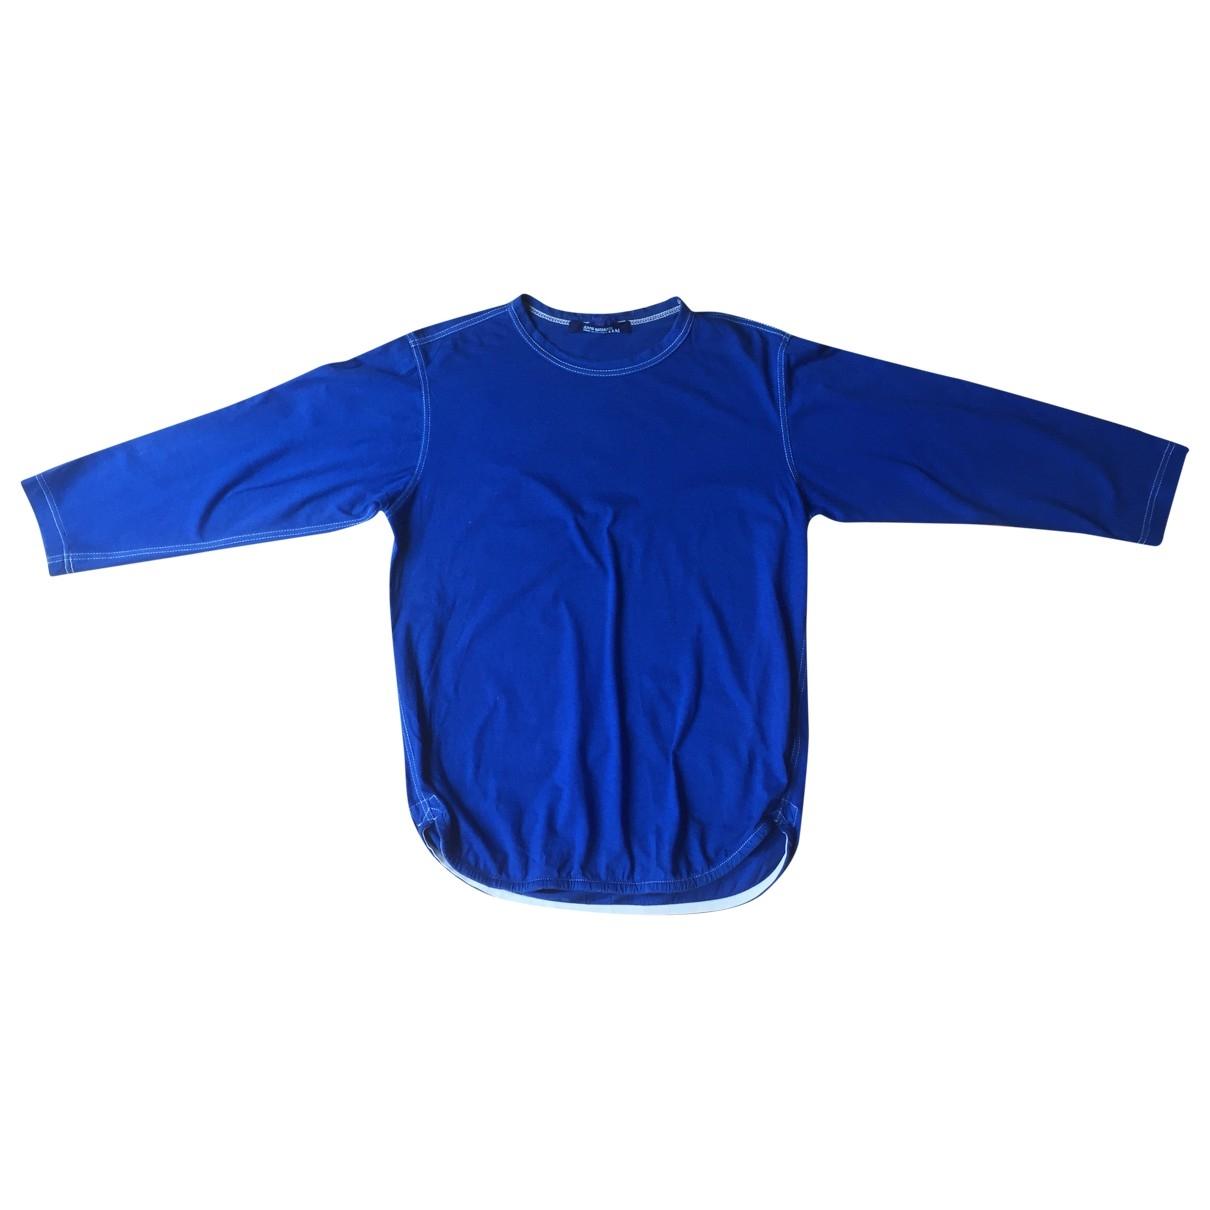 Junya Watanabe \N Blue Cotton T-shirts for Men S International